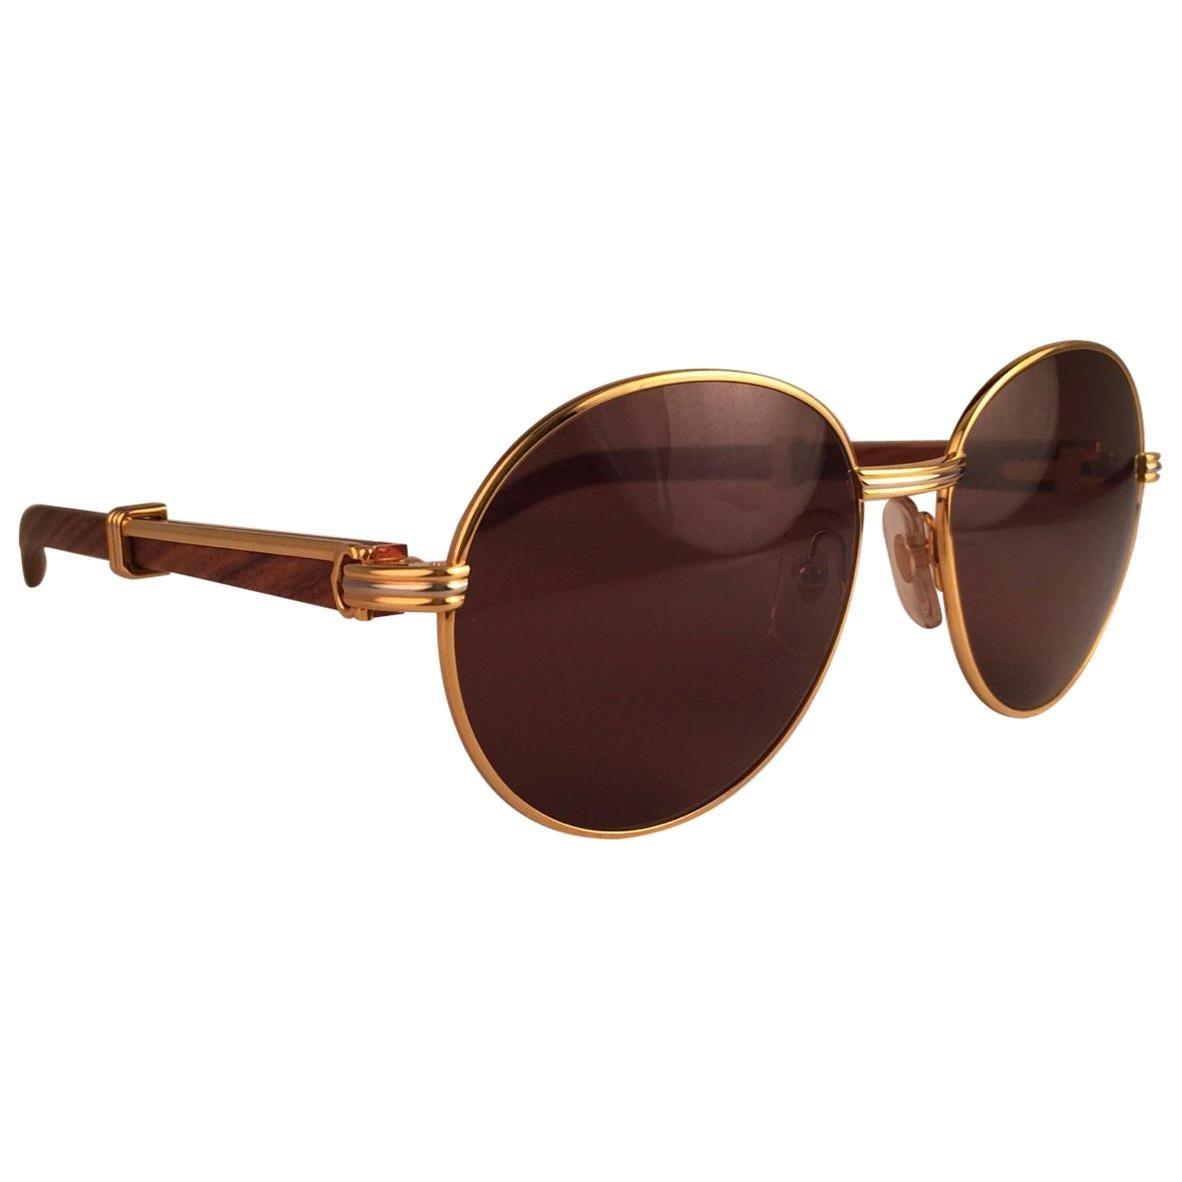 c8dbdabfbca Vintage and Designer Sunglasses - 1